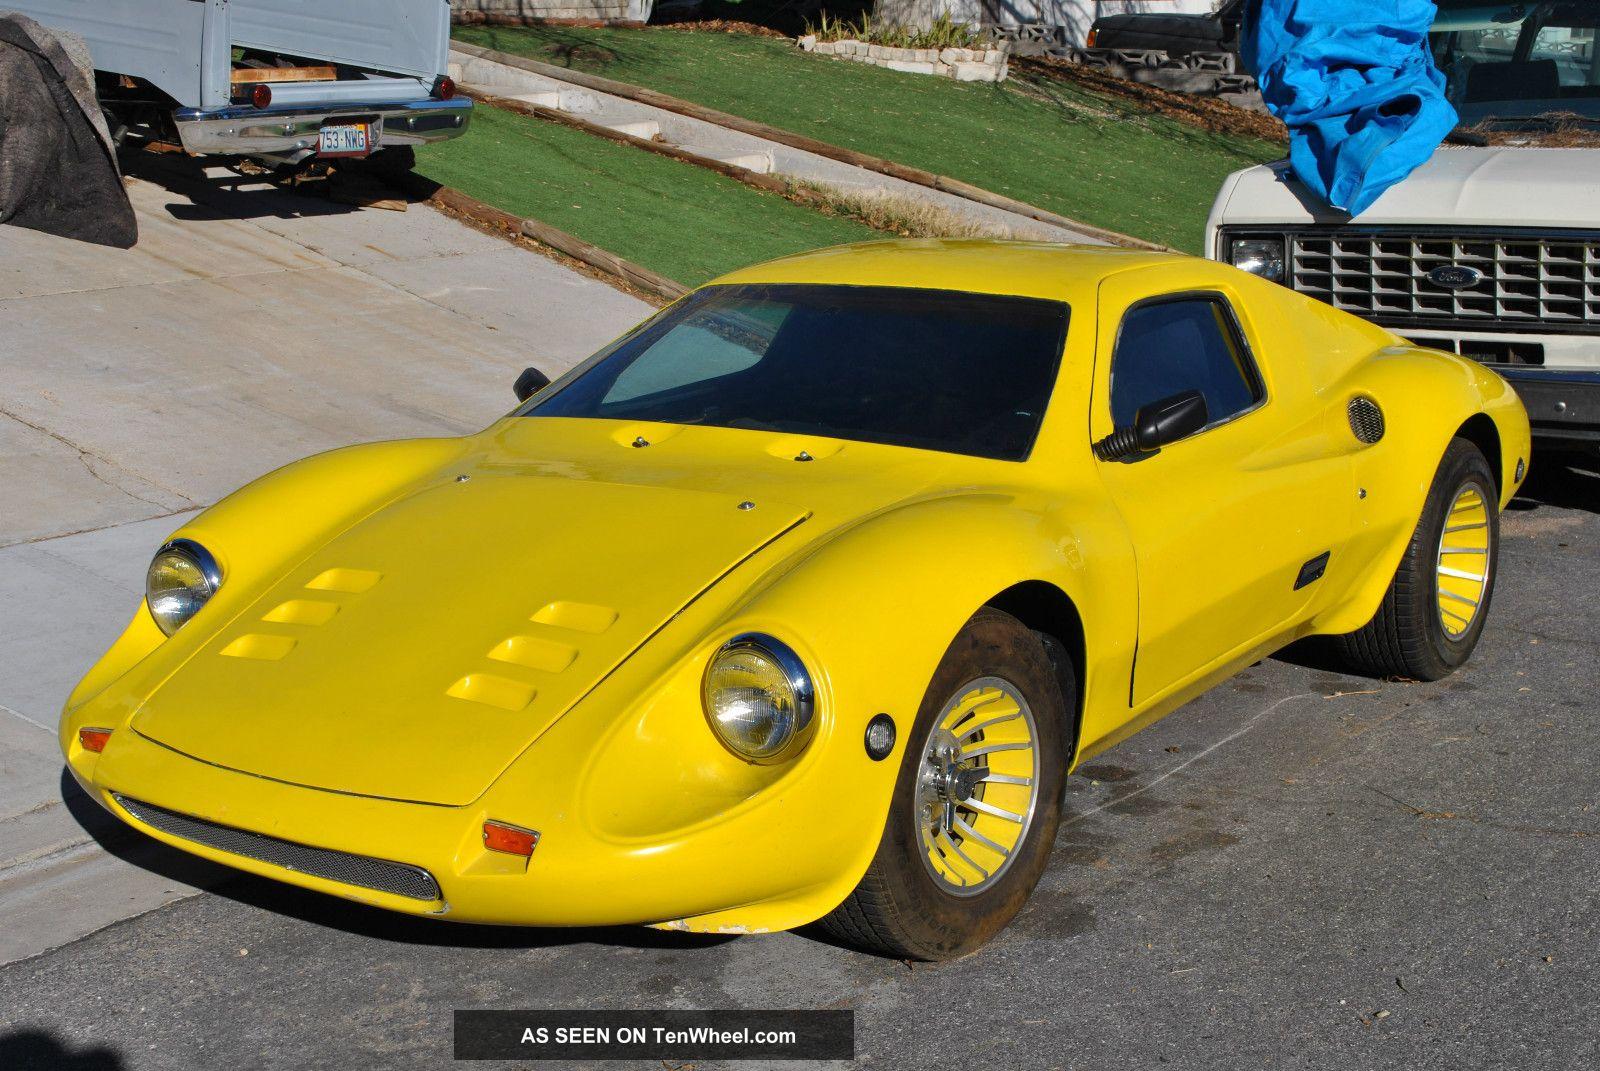 Ferrari Dino 246 Look - A - Like Kit Car Volkswagen 1835 ...